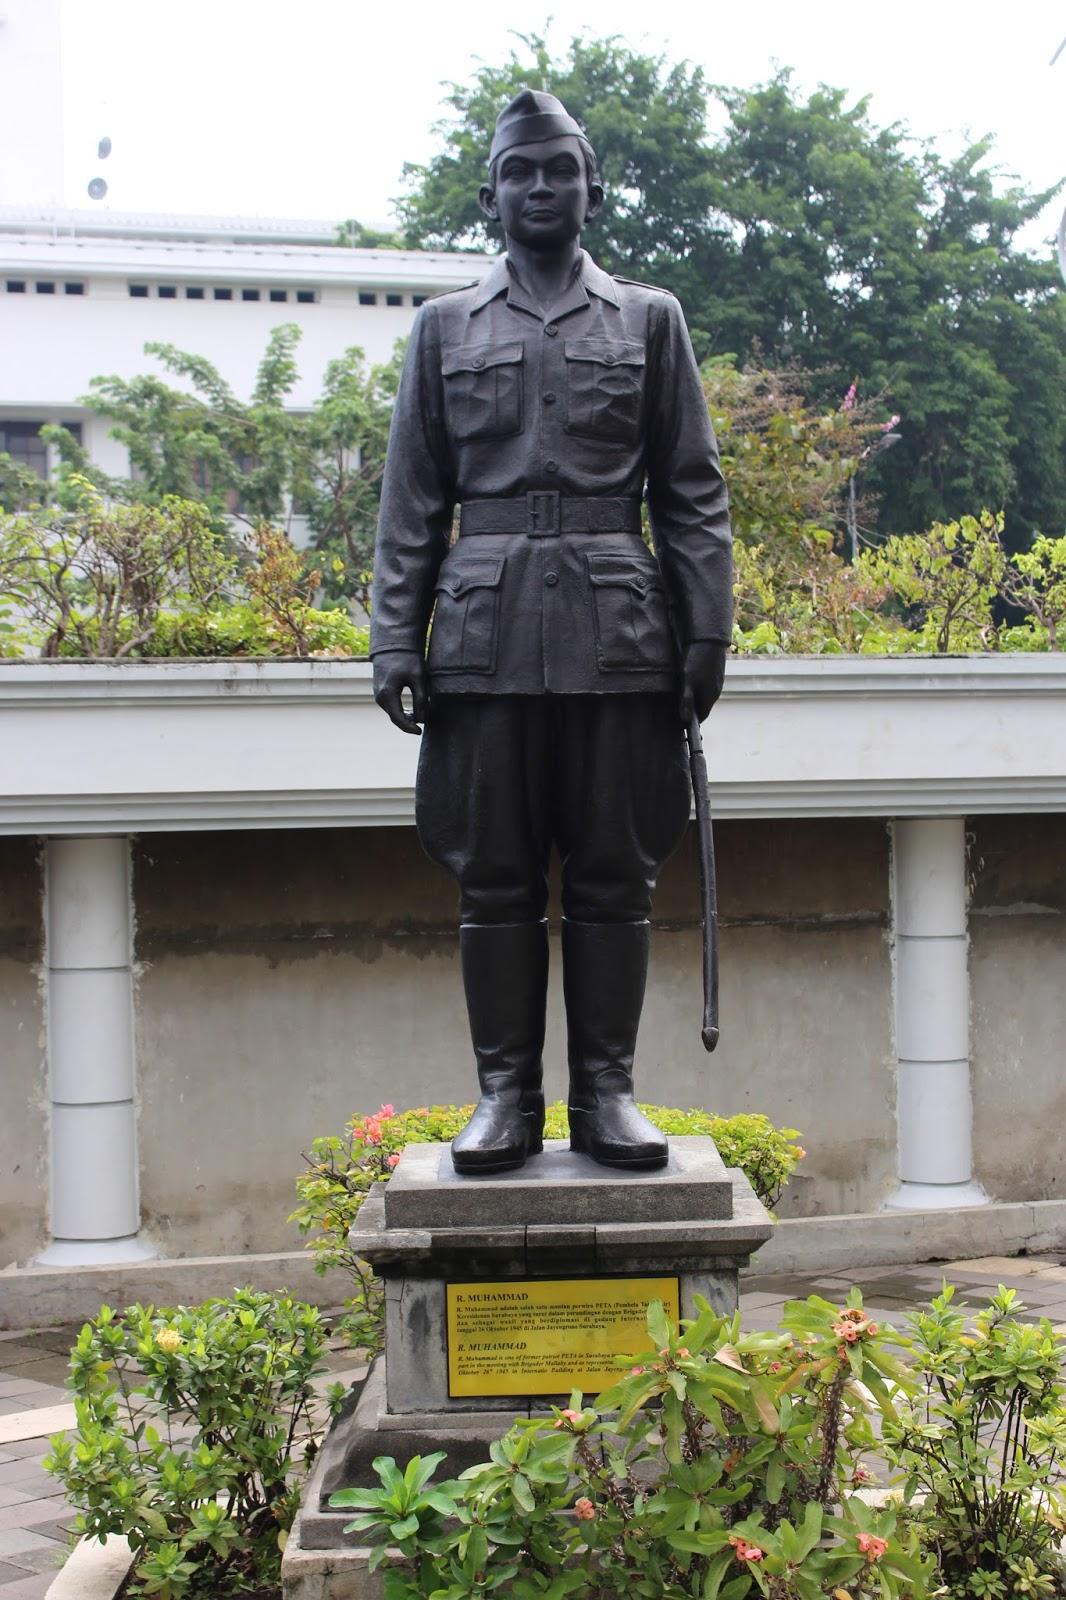 Patung pahlwan nasional, Muhammad Mangundiprojo di Museum Sepuluh Nopember, Surabaya